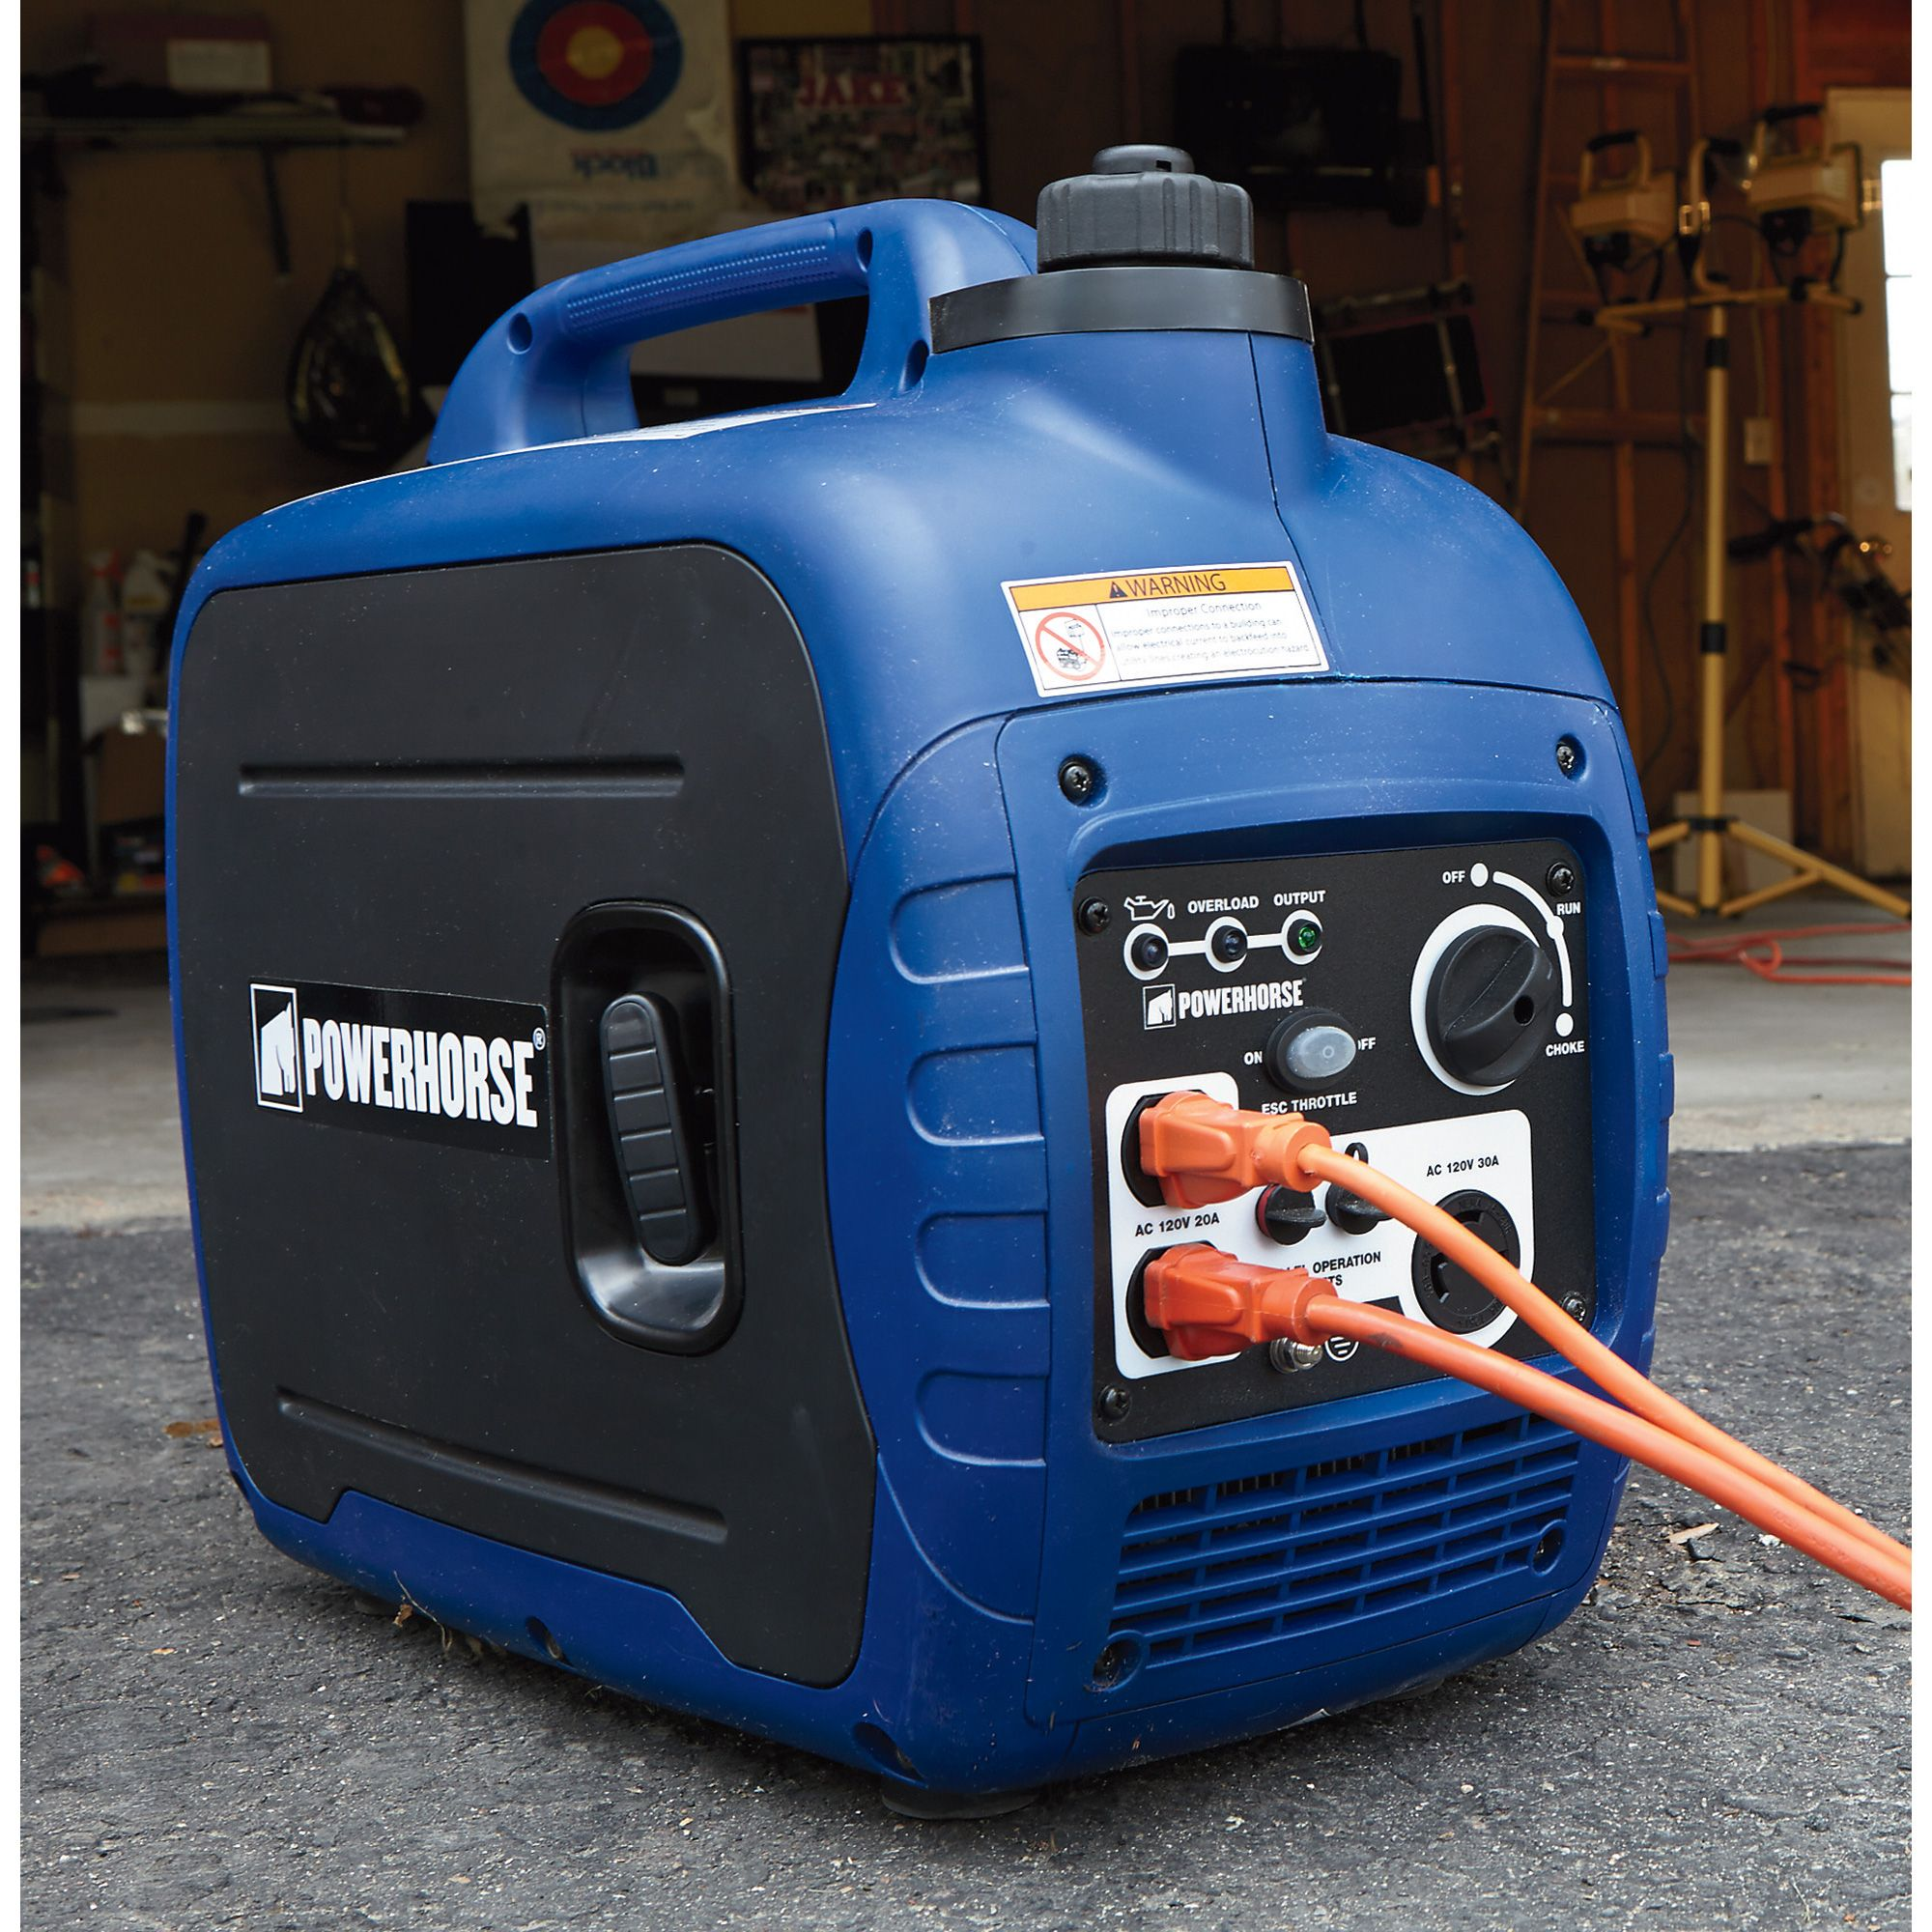 Powerhorse Portable Inverter Generator 2000 Surge Watts